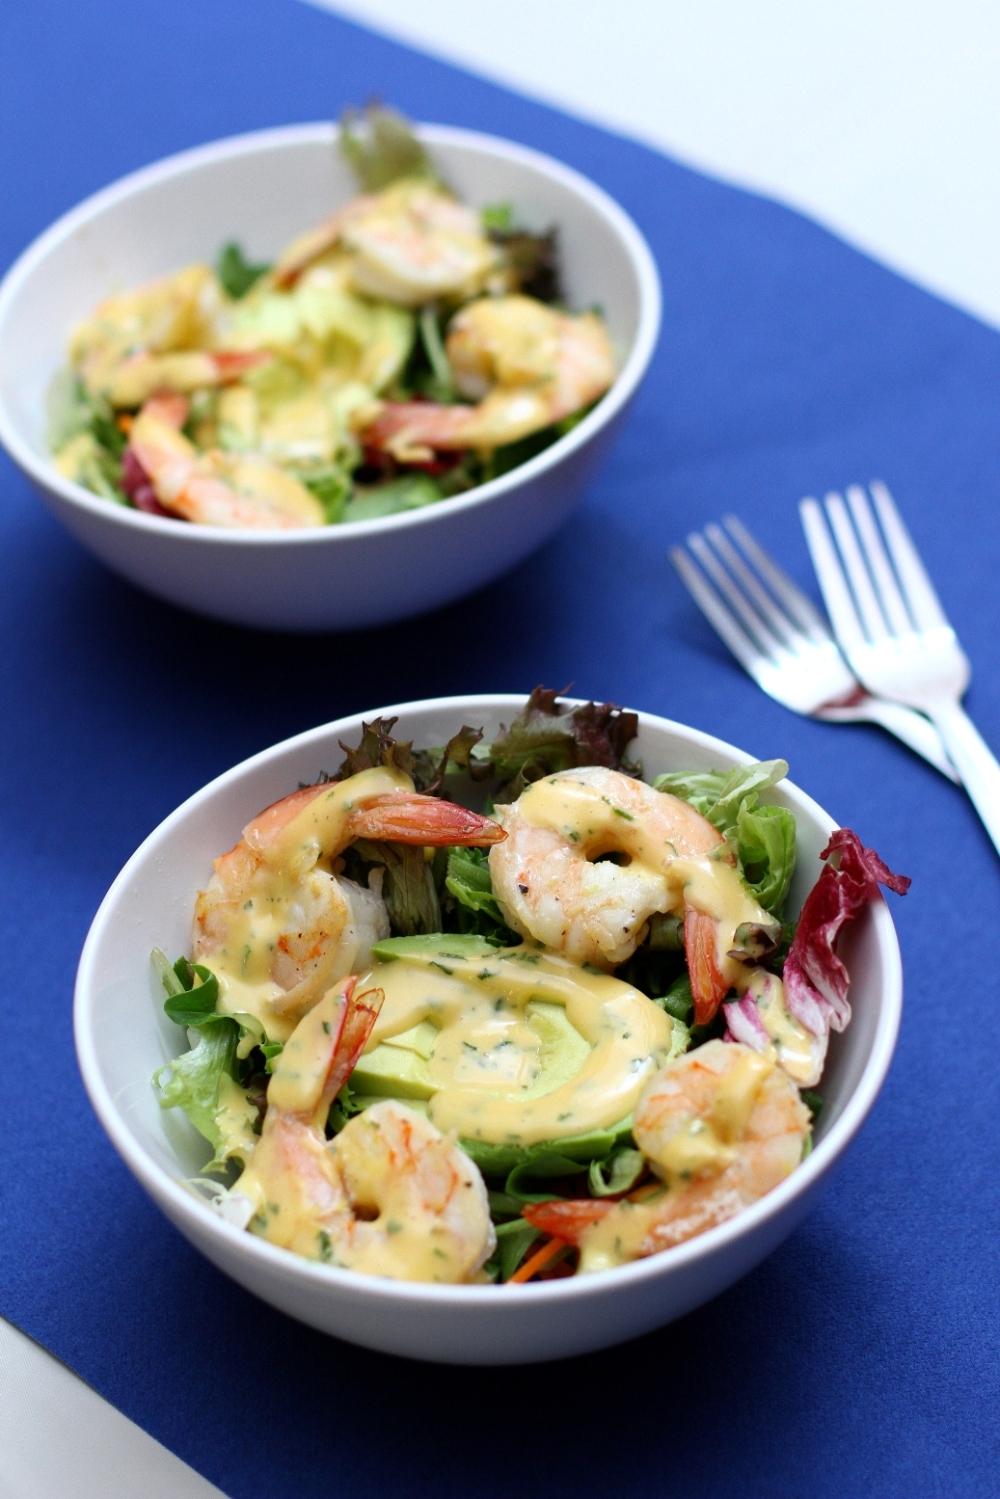 Prawns and Avocado Salad with Homemade Coriander Mayo